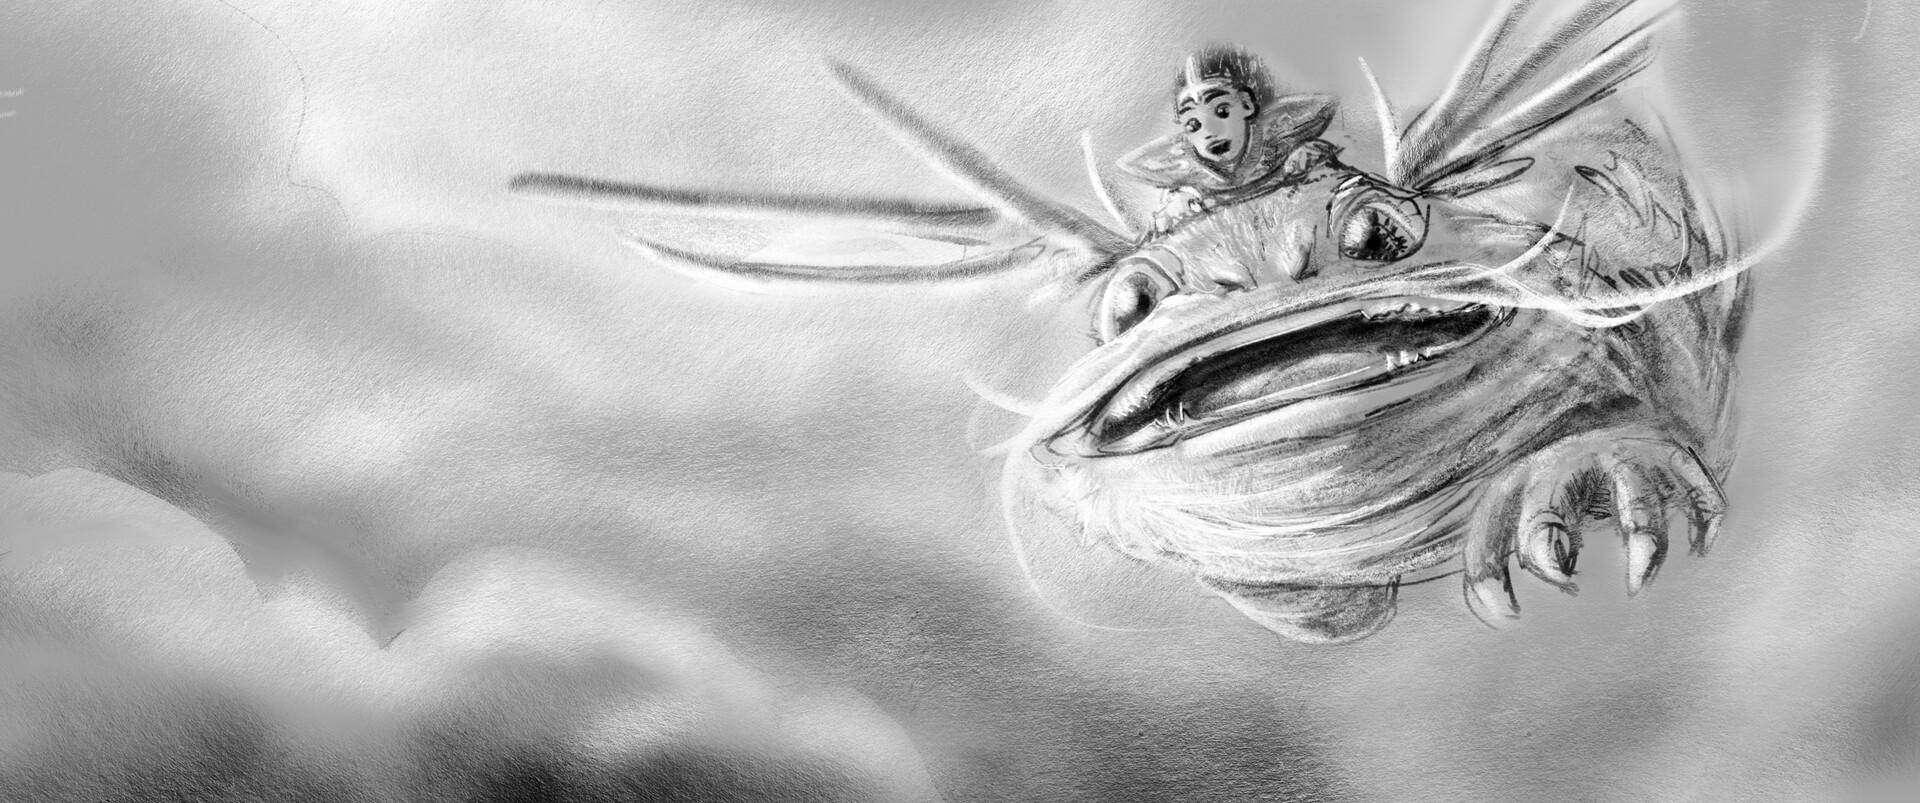 Hunter culberson mojo dragon sketch